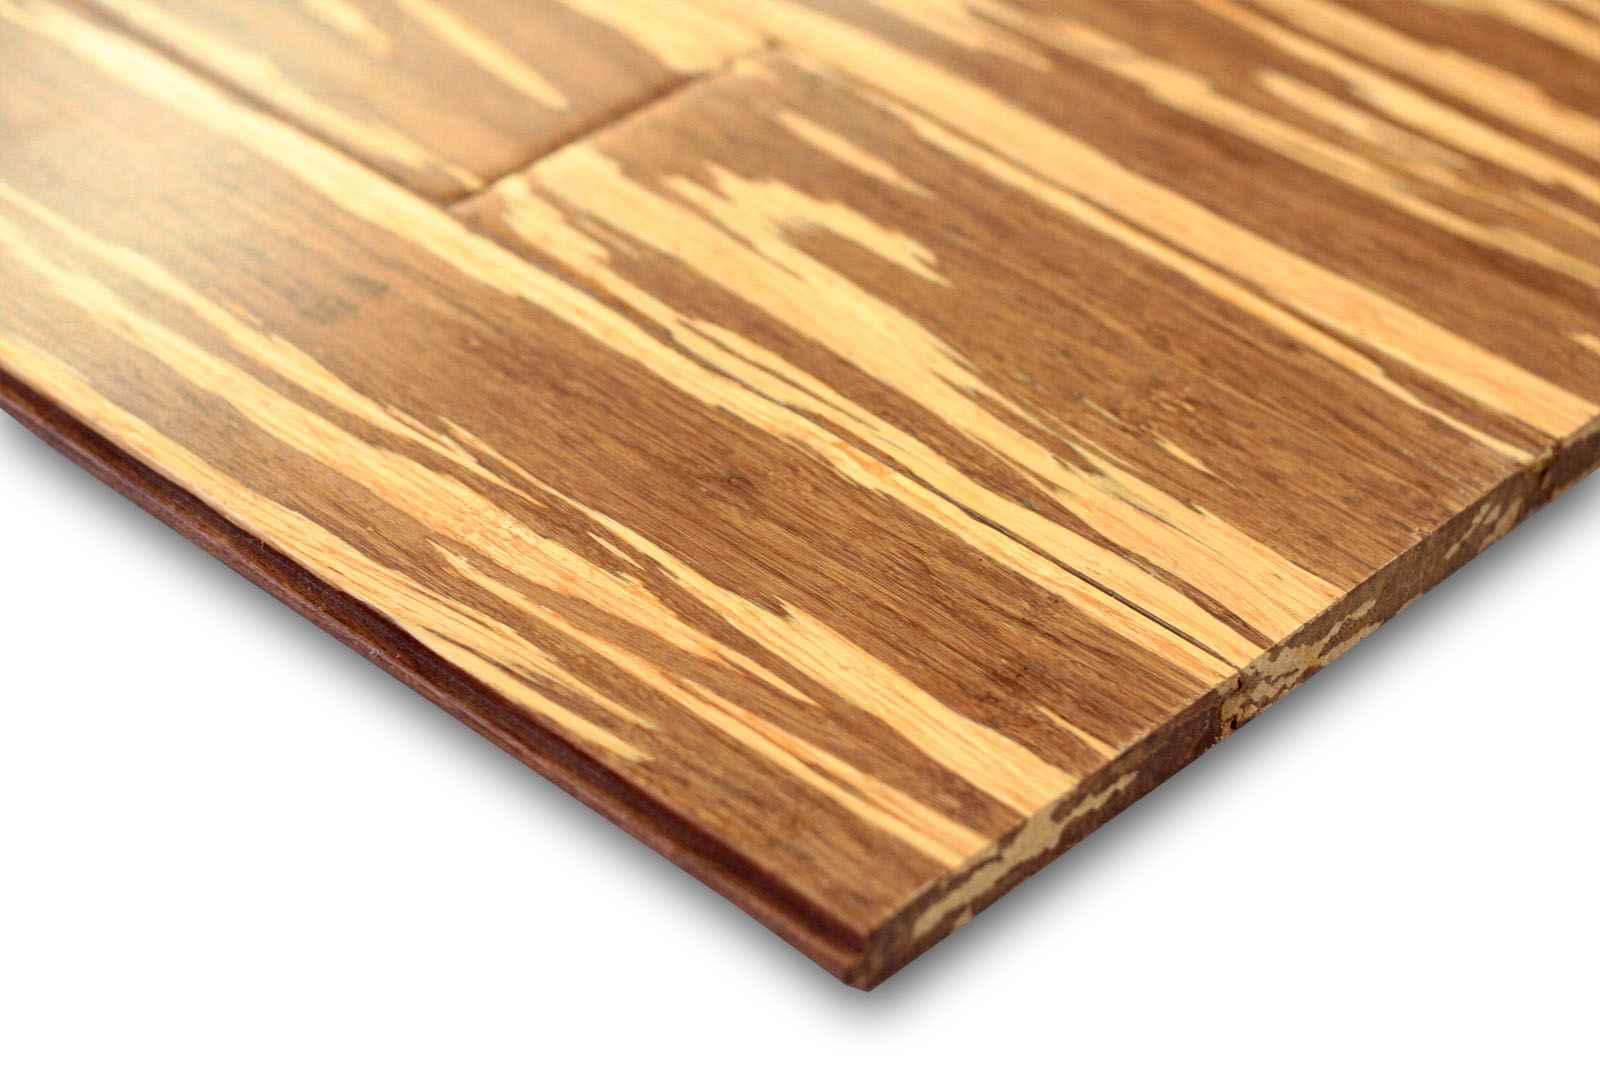 Cheap Bamboo Flooring in Zebra Pattern